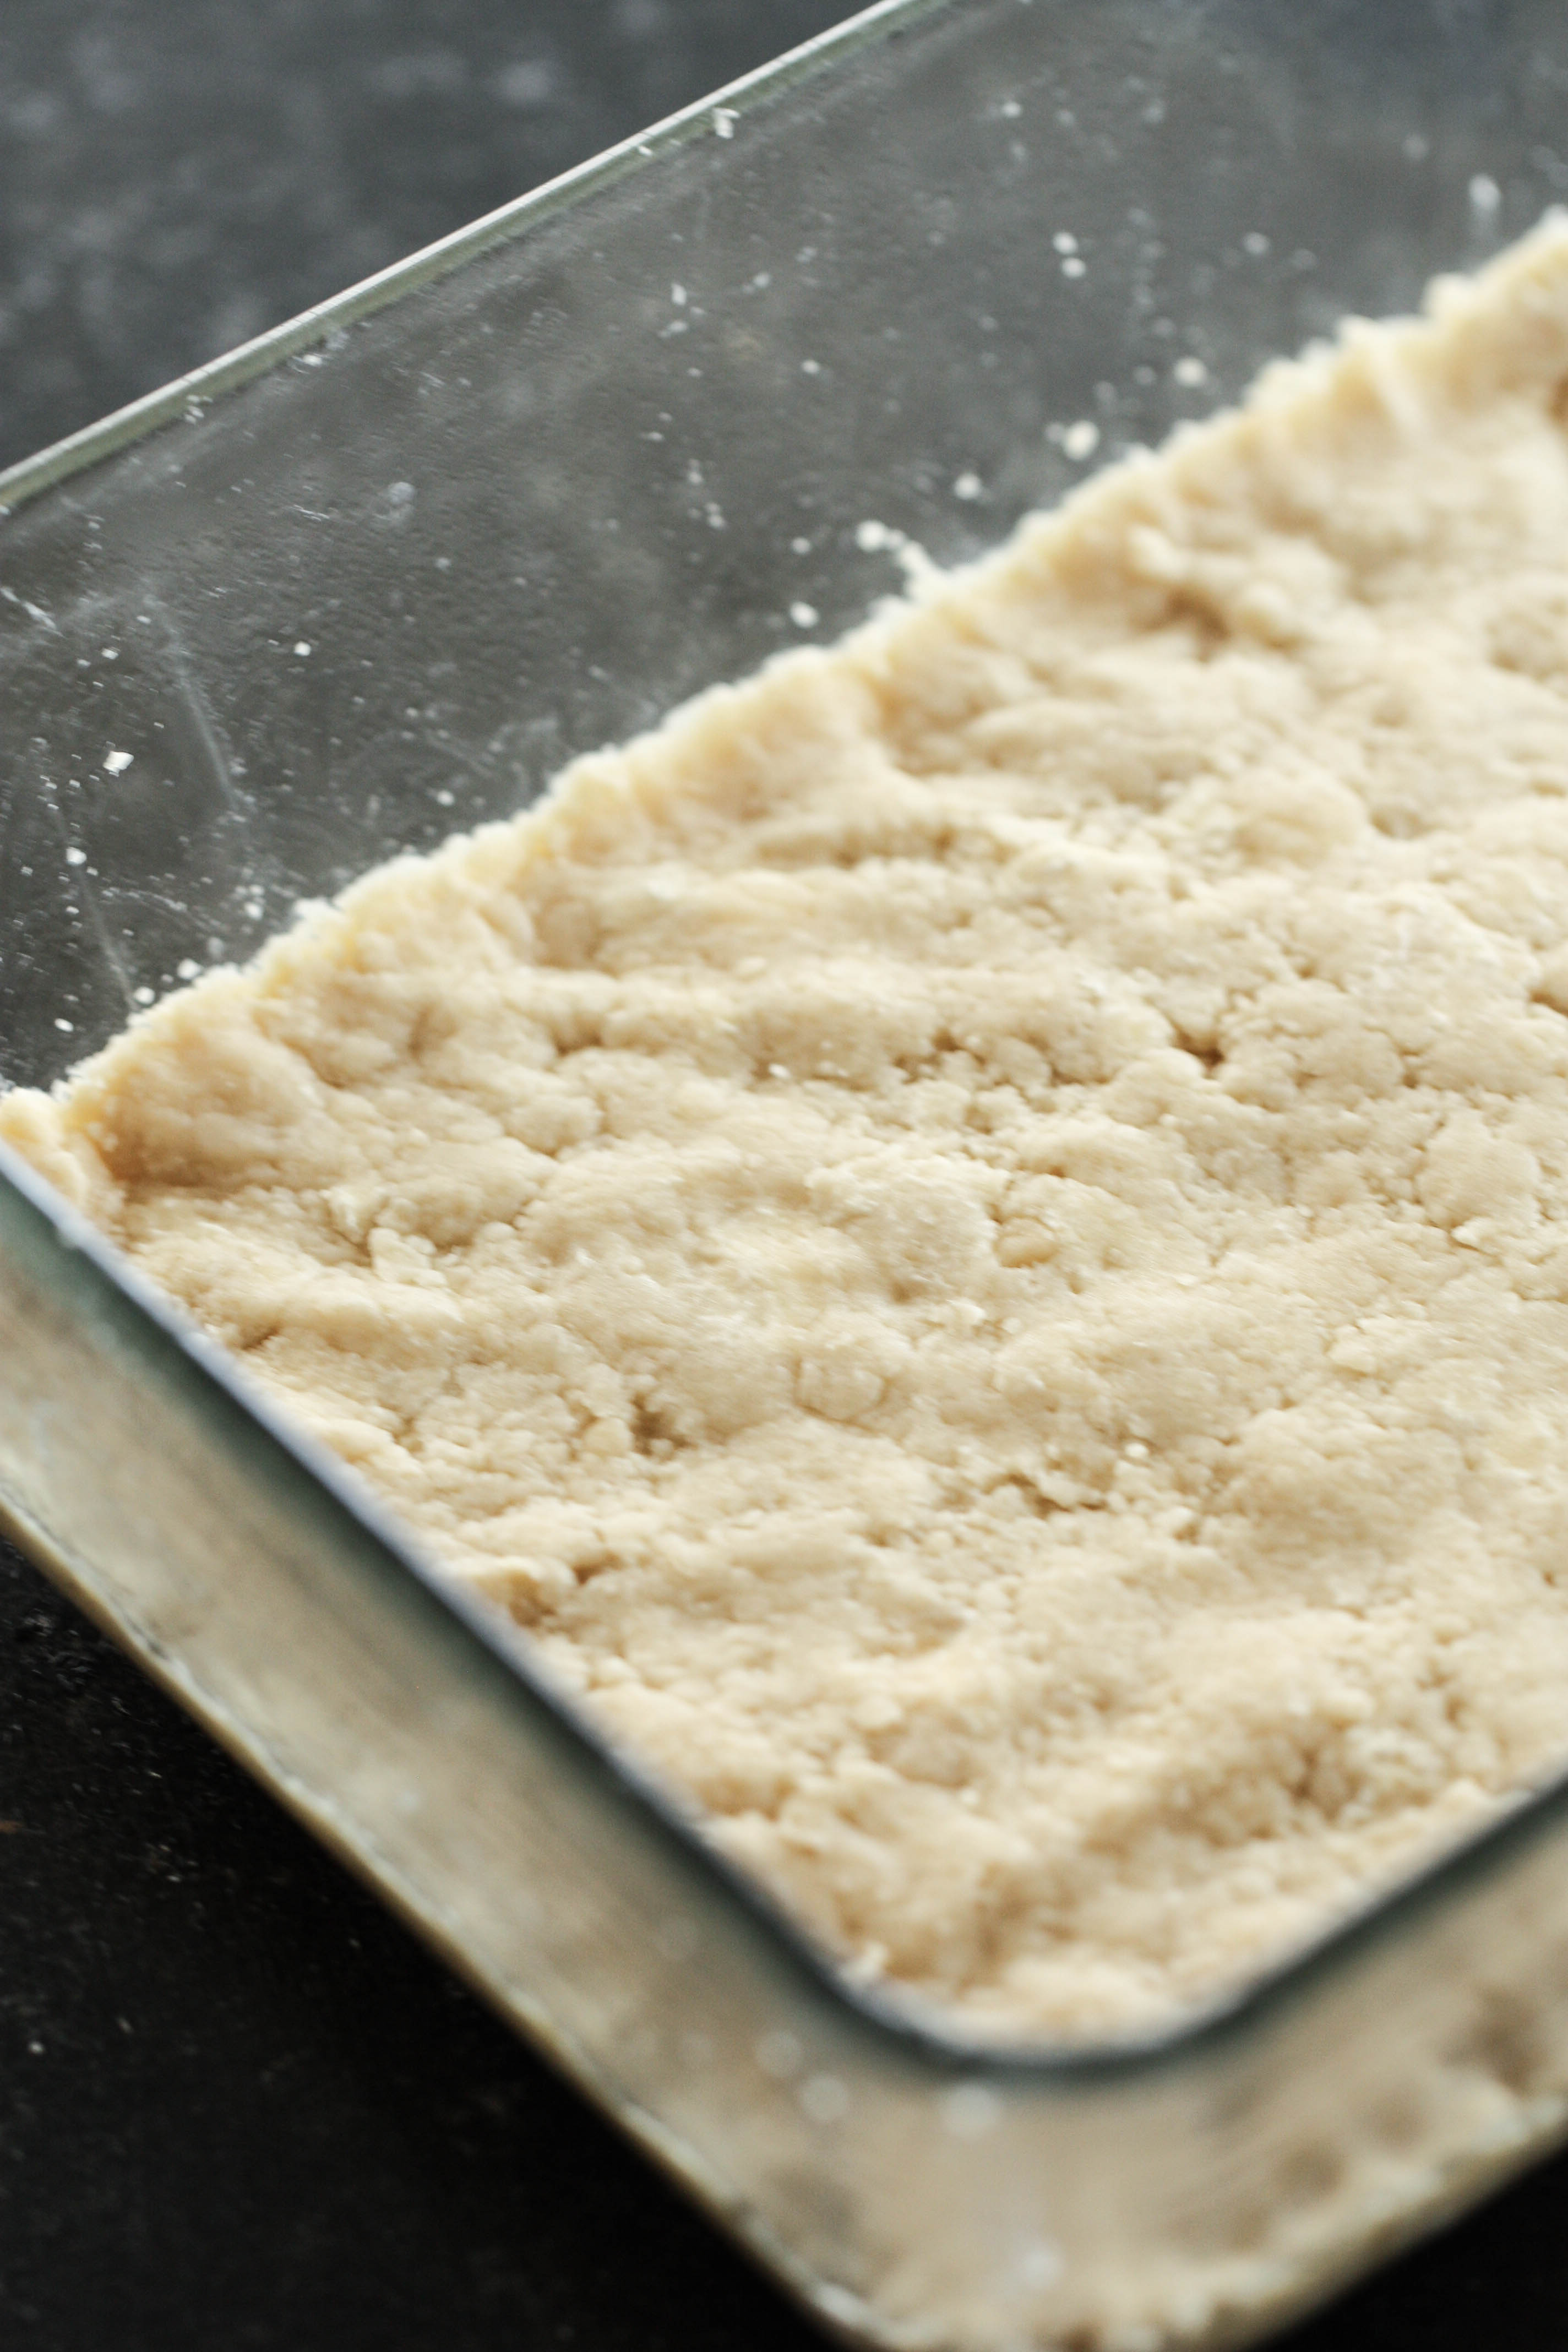 Shortbread crust in glass pan